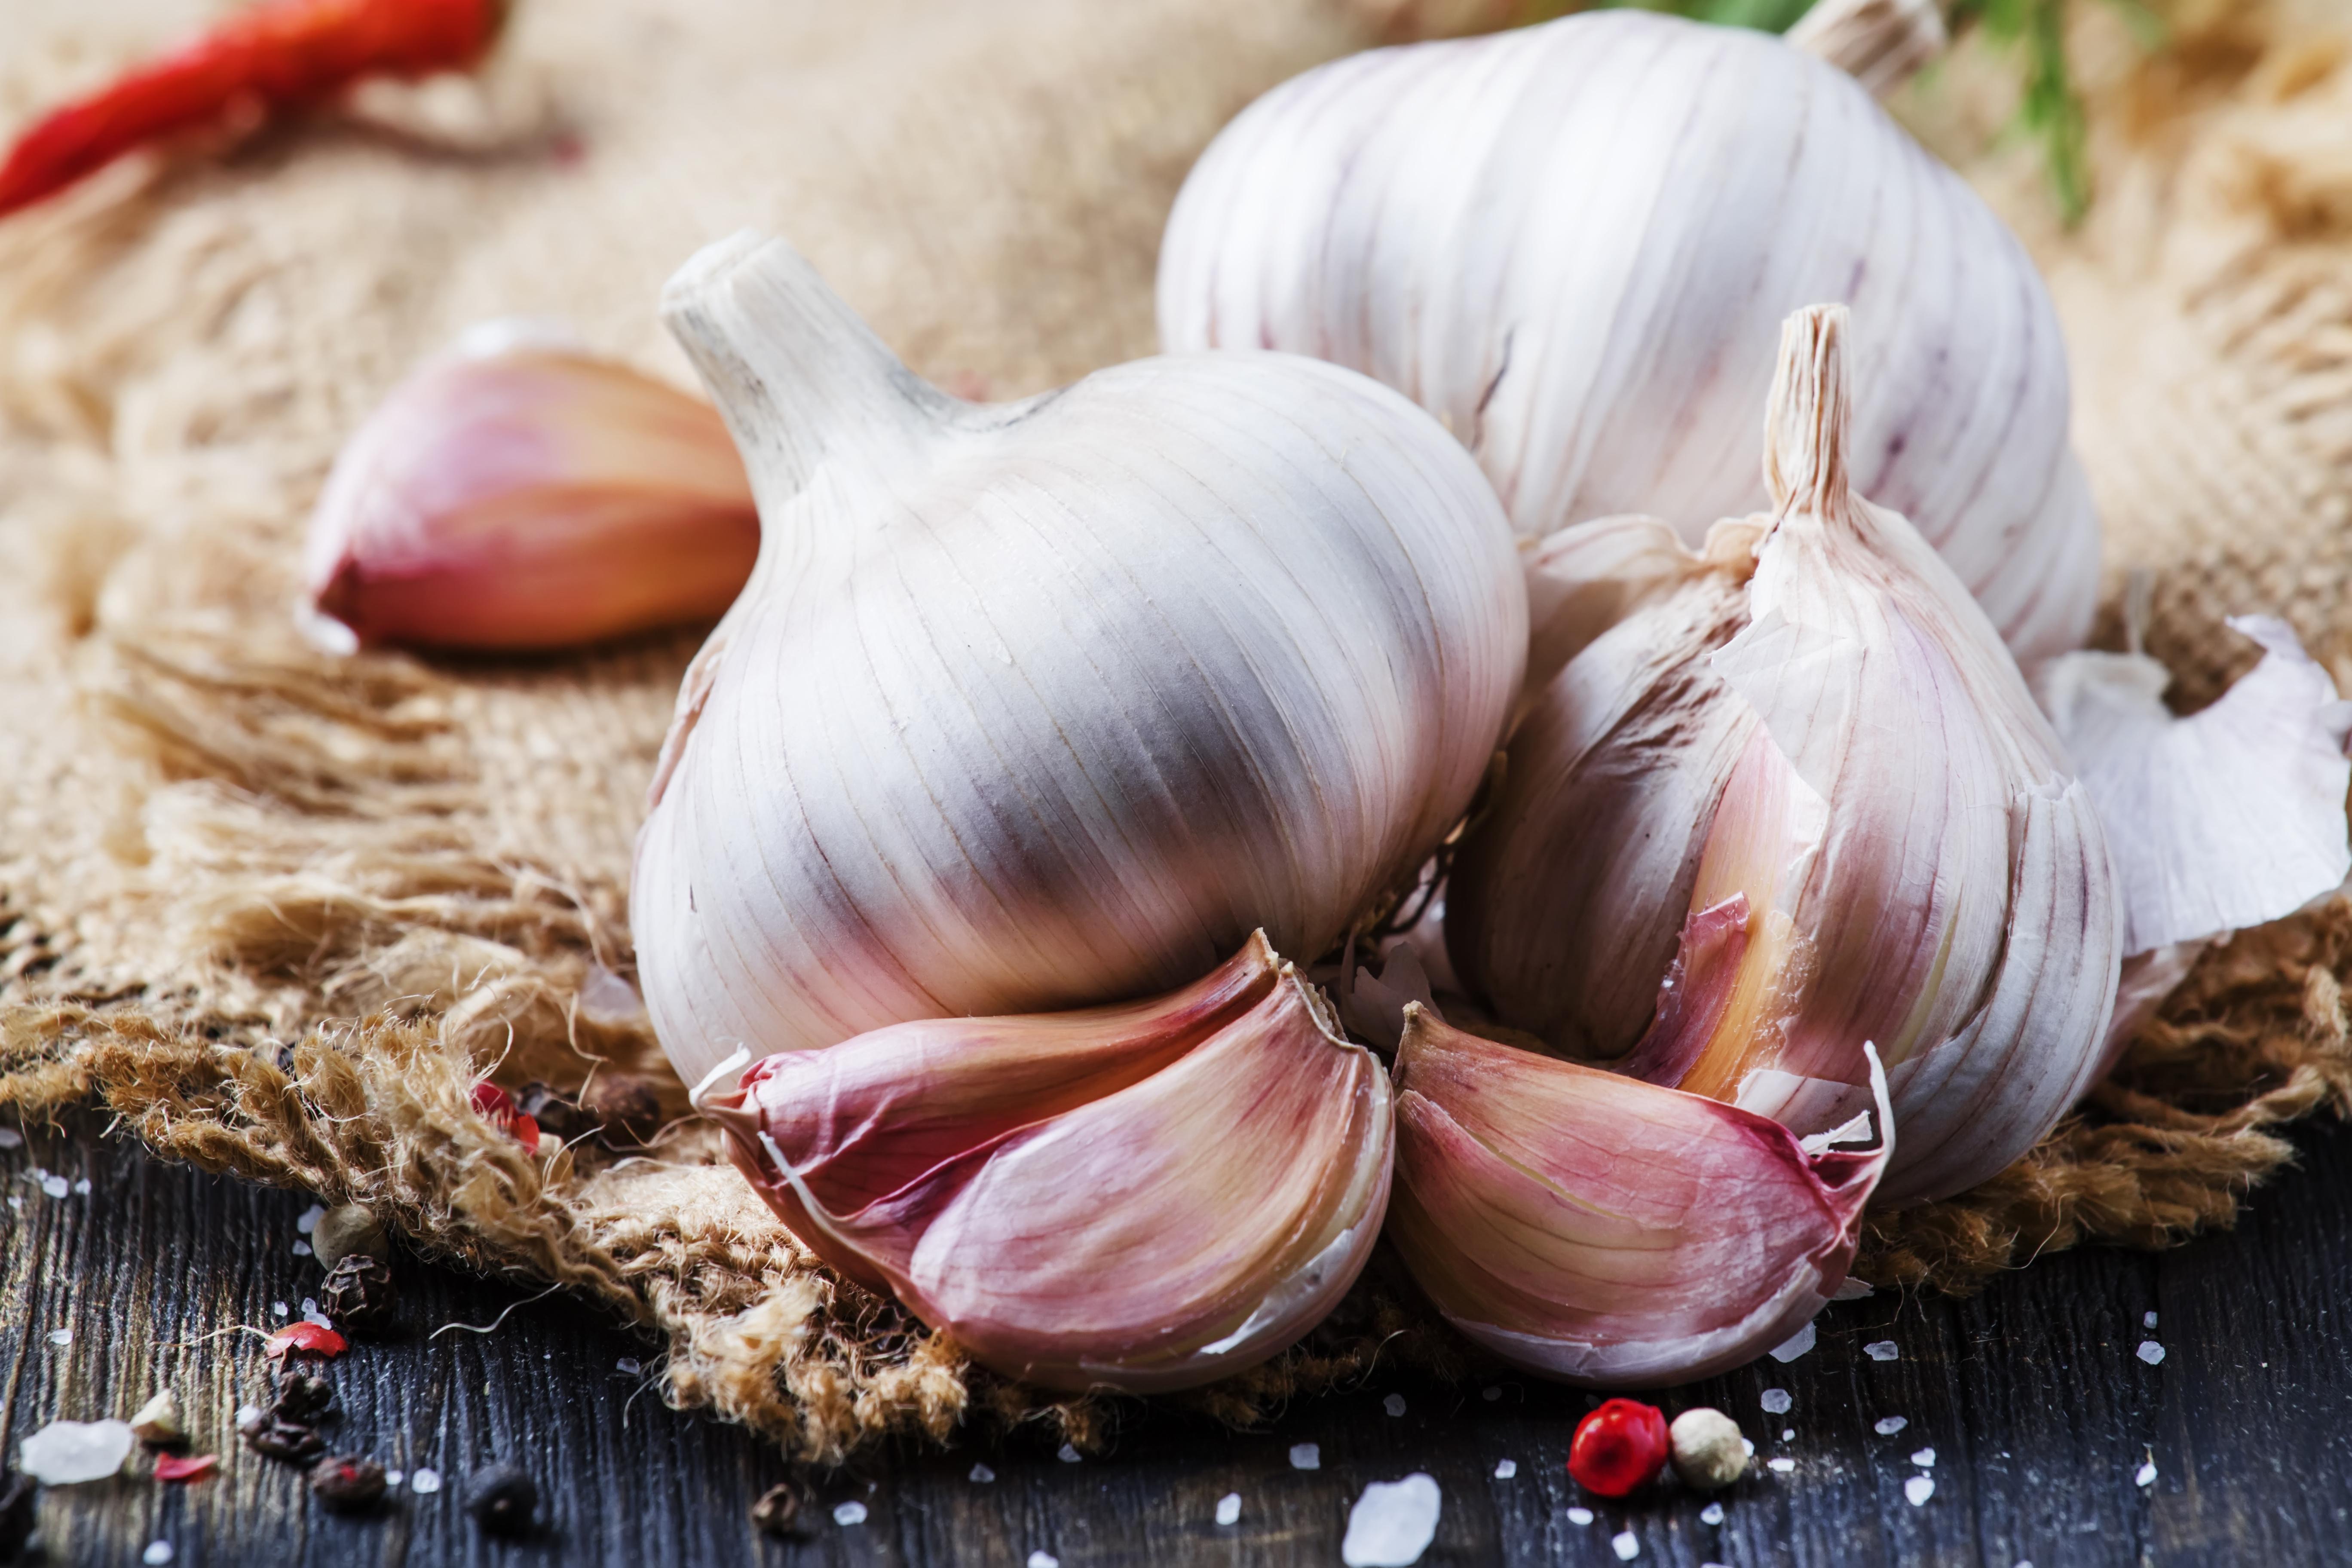 Benefit of Garlic